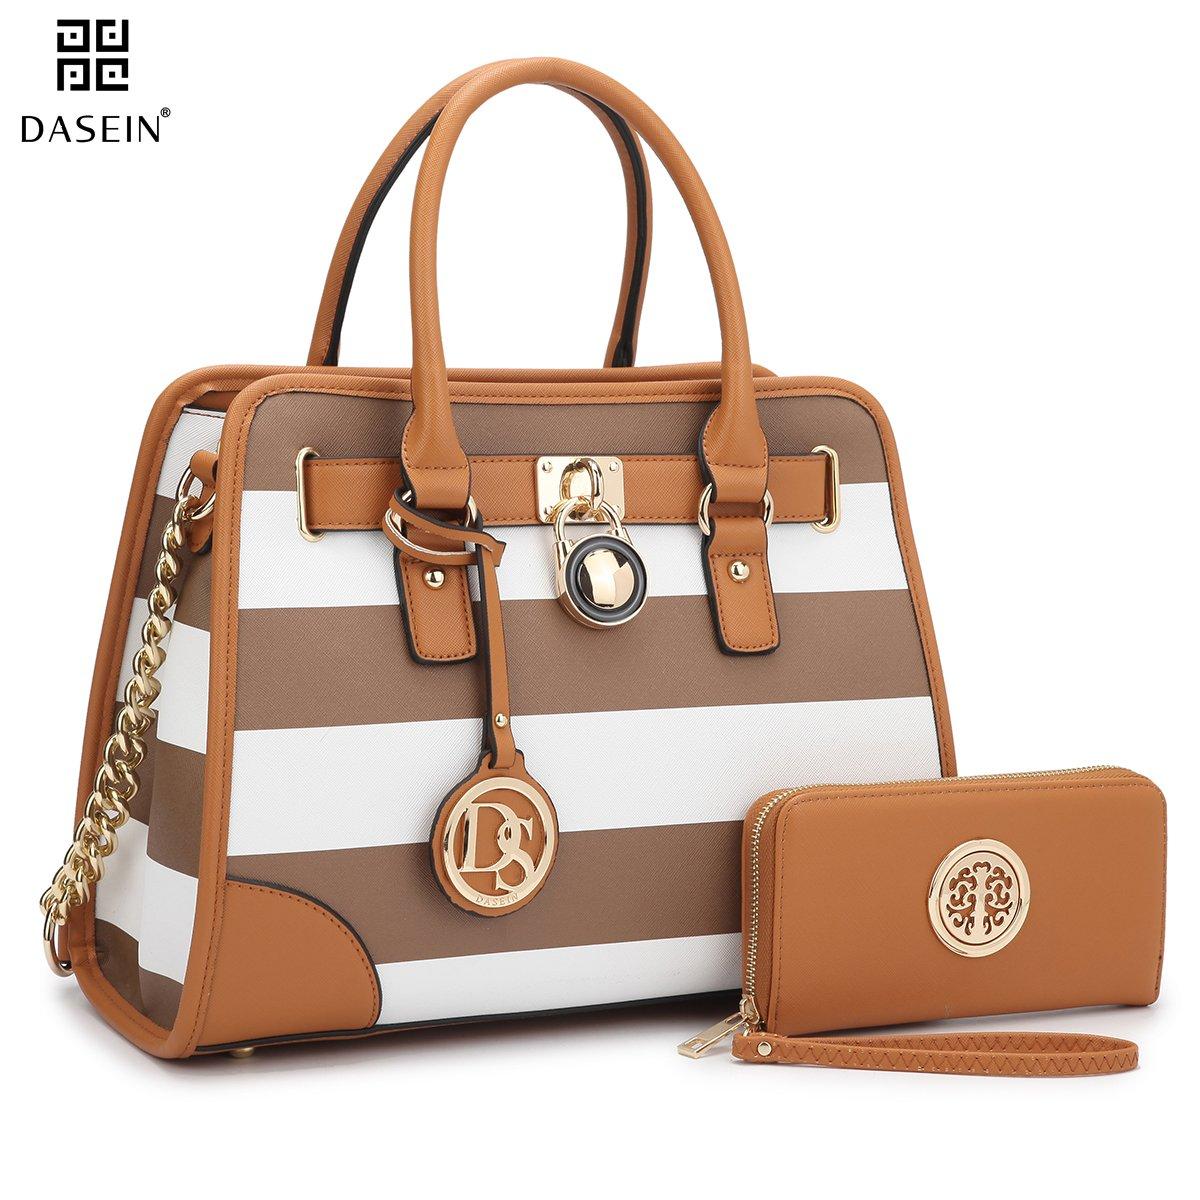 Dasein Women's Designer Padlock Striped Belted Top Handle Satchel Handbag Purse Shoulder Bag With Wallet (Coffee/White)